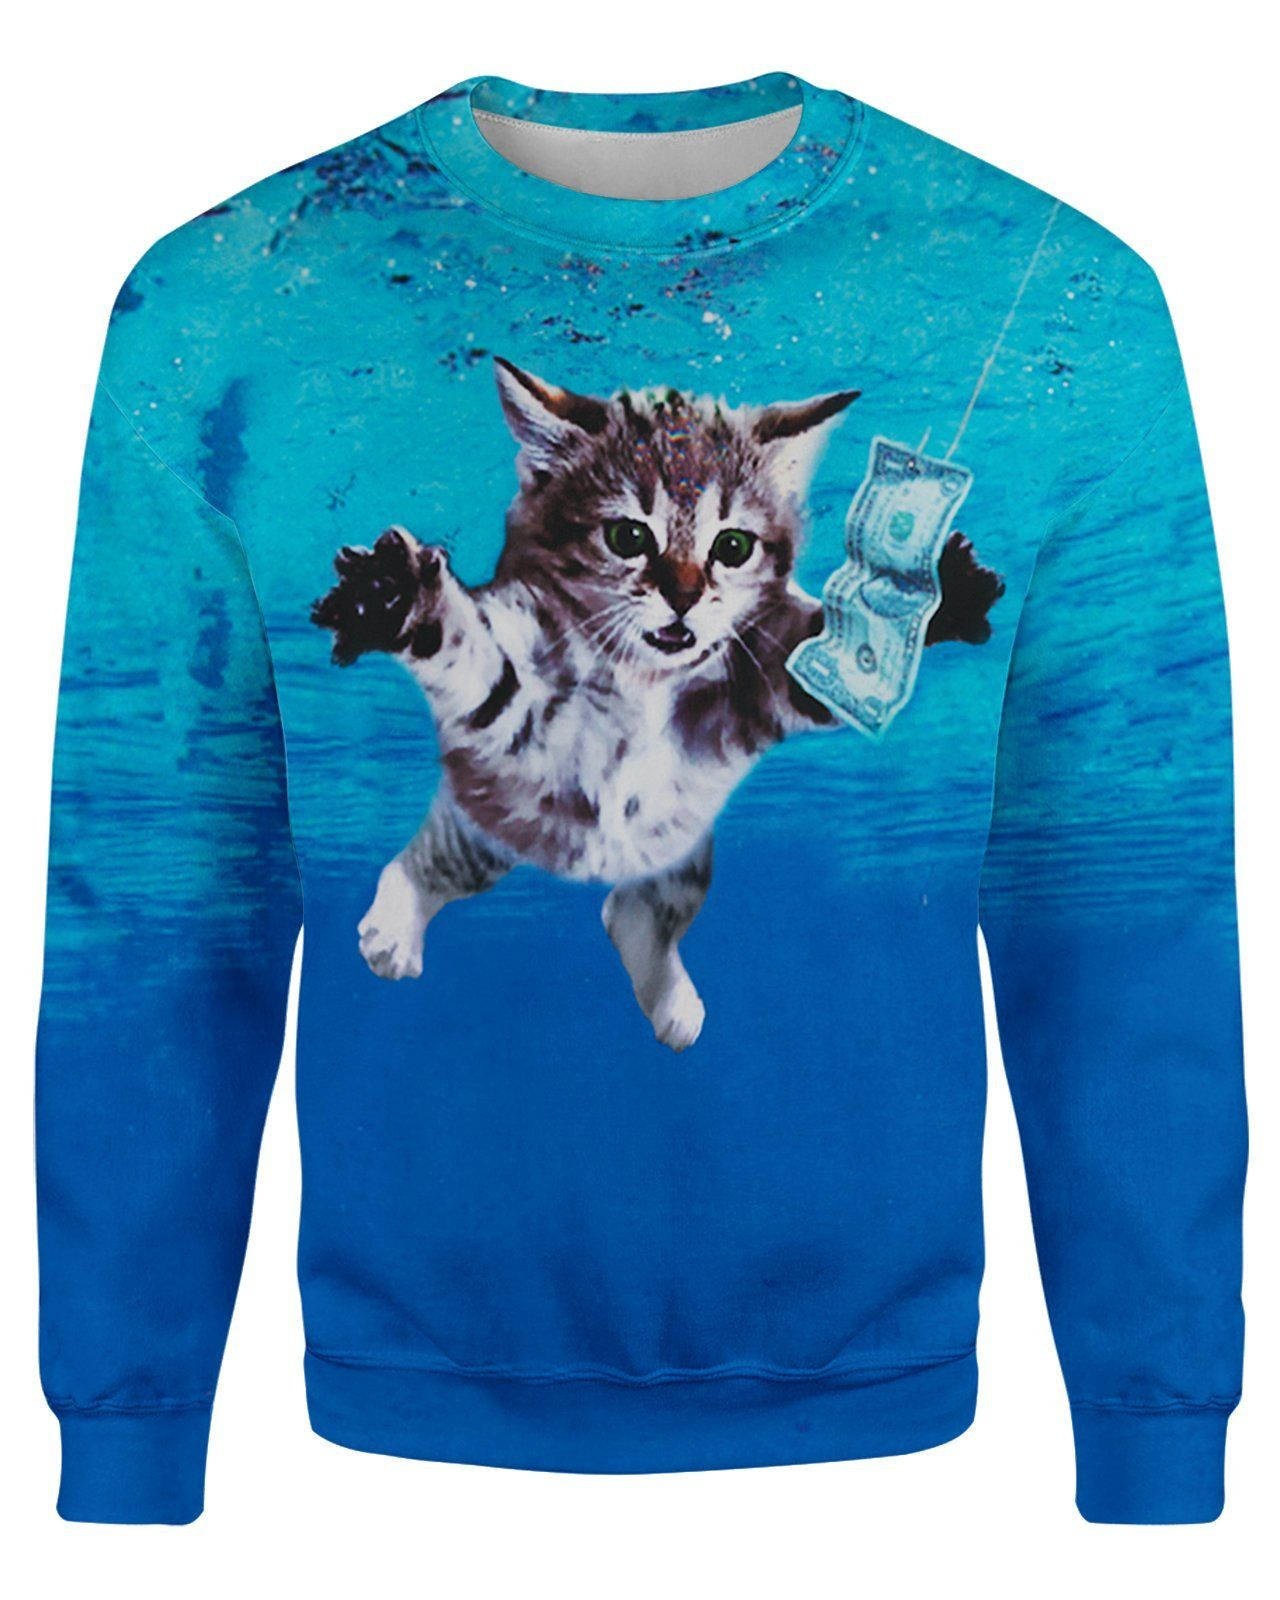 Cat Cobain Unisex Sweatshirt In 2021 Sweatshirts Cat Sweatshirt Long Sleeve Sweatshirts [ 1600 x 1280 Pixel ]